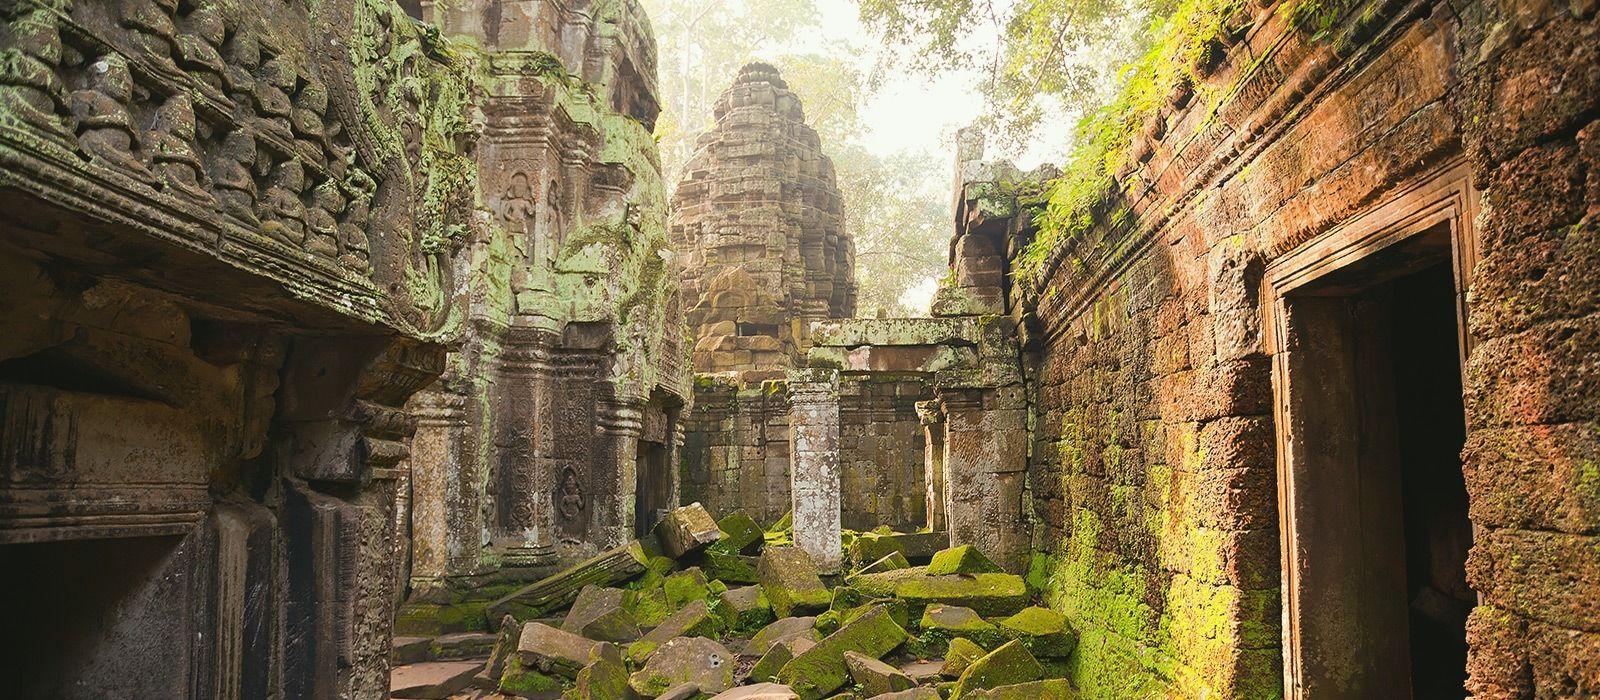 Rundreise Vietnam Kambodscha – Mekong & mehr Urlaub 3